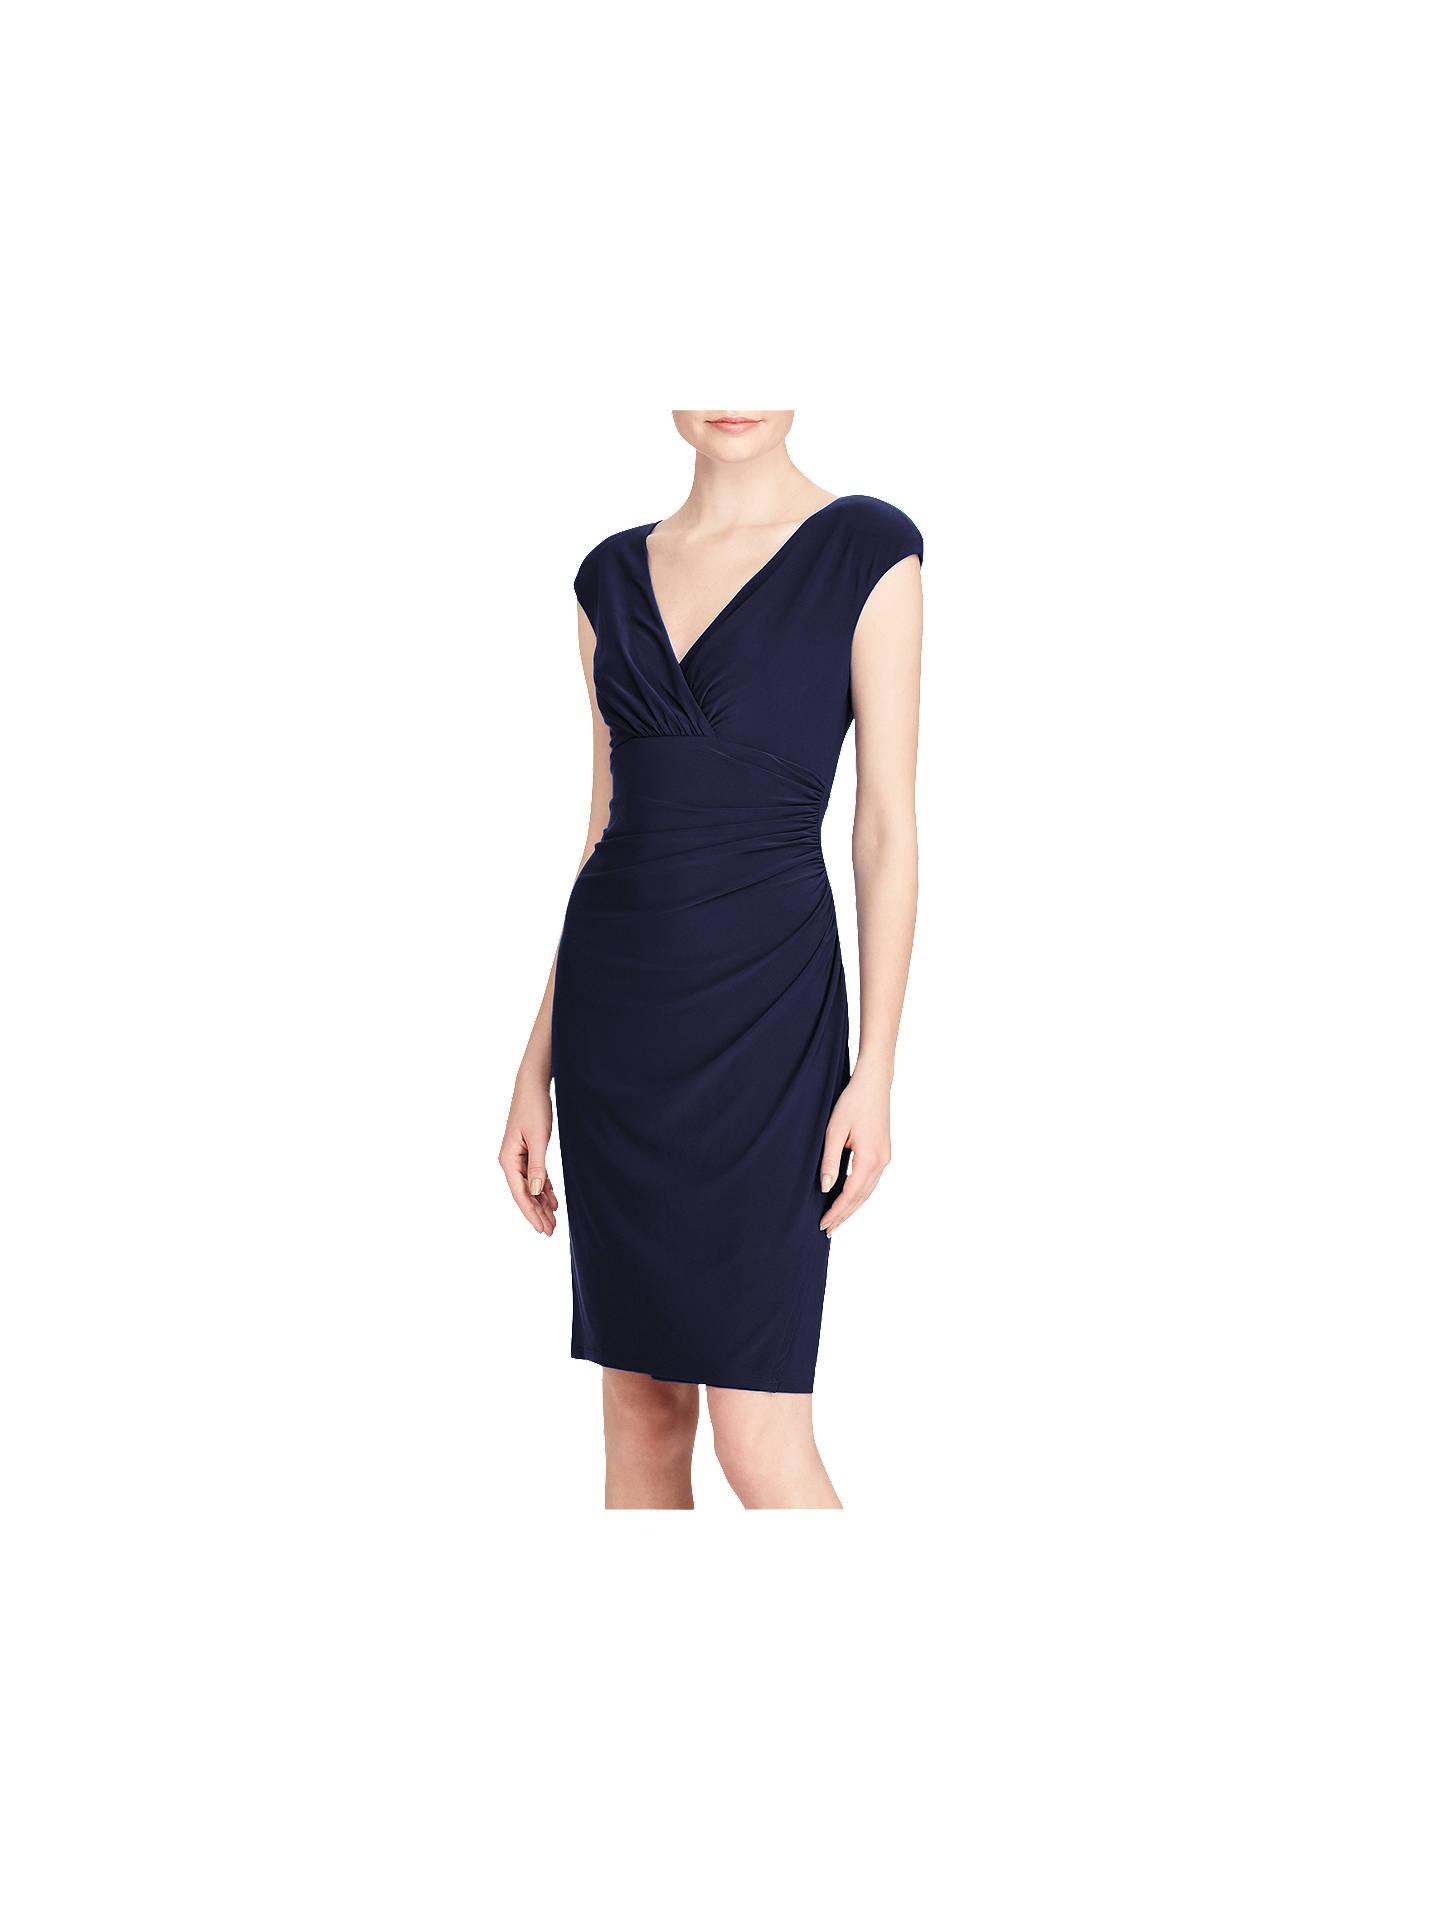 be35d68c Buy Lauren Ralph Lauren Adara Capped Sleeve Dress, Lighthouse Navy, 6  Online at johnlewis ...